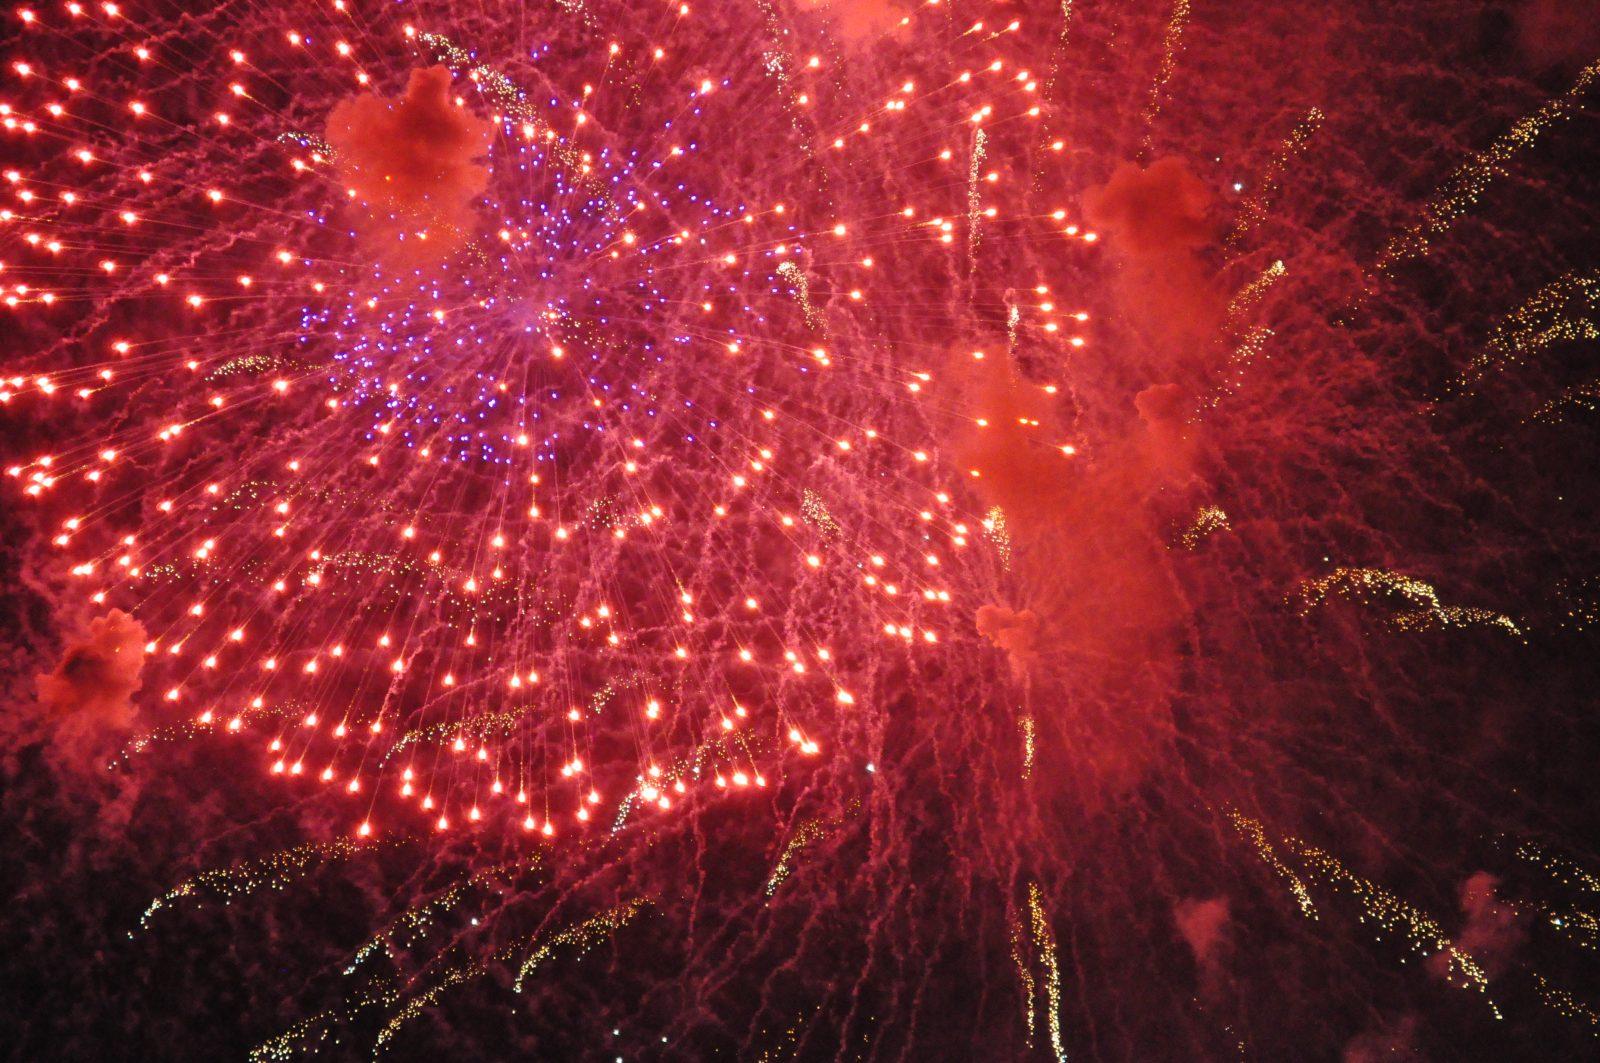 Red Fireworks Free Stock Photo: Fireworks - Free Stock Photos